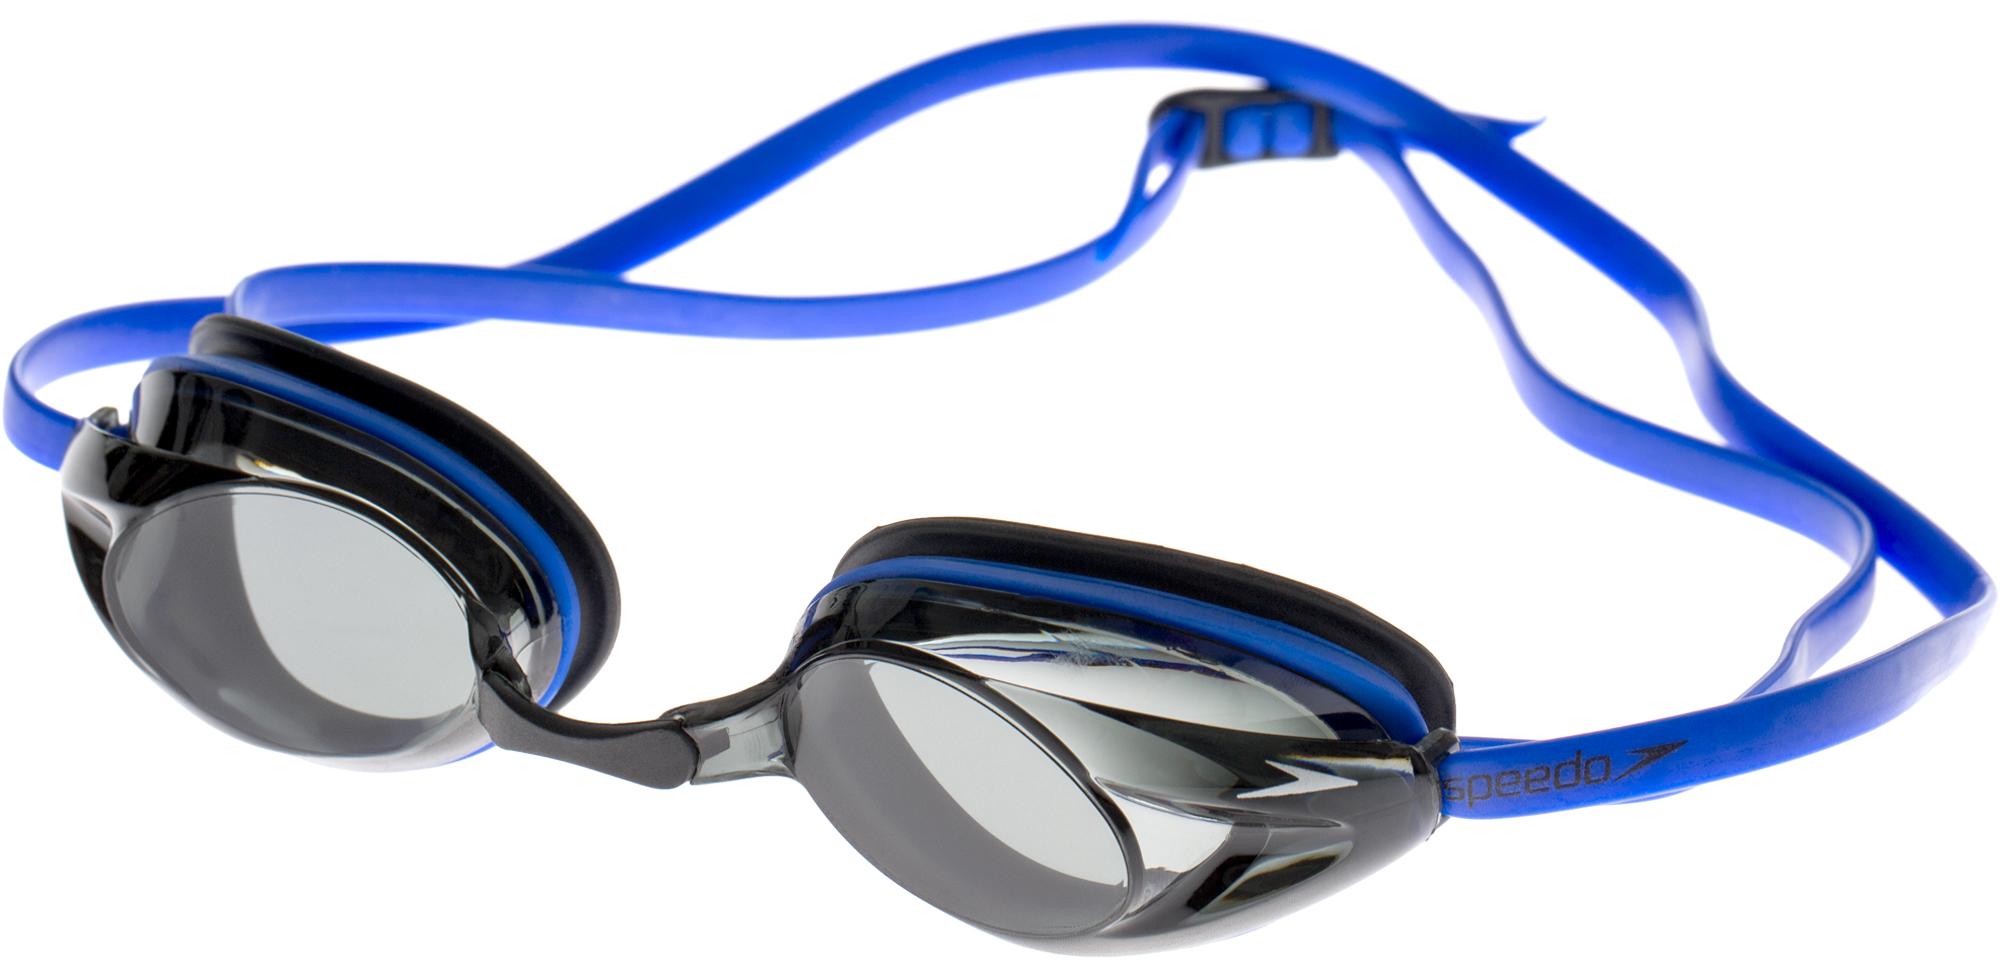 Speedo Очки для плавания Speedo Opal speedo очки для плавания speedo futura biofuse